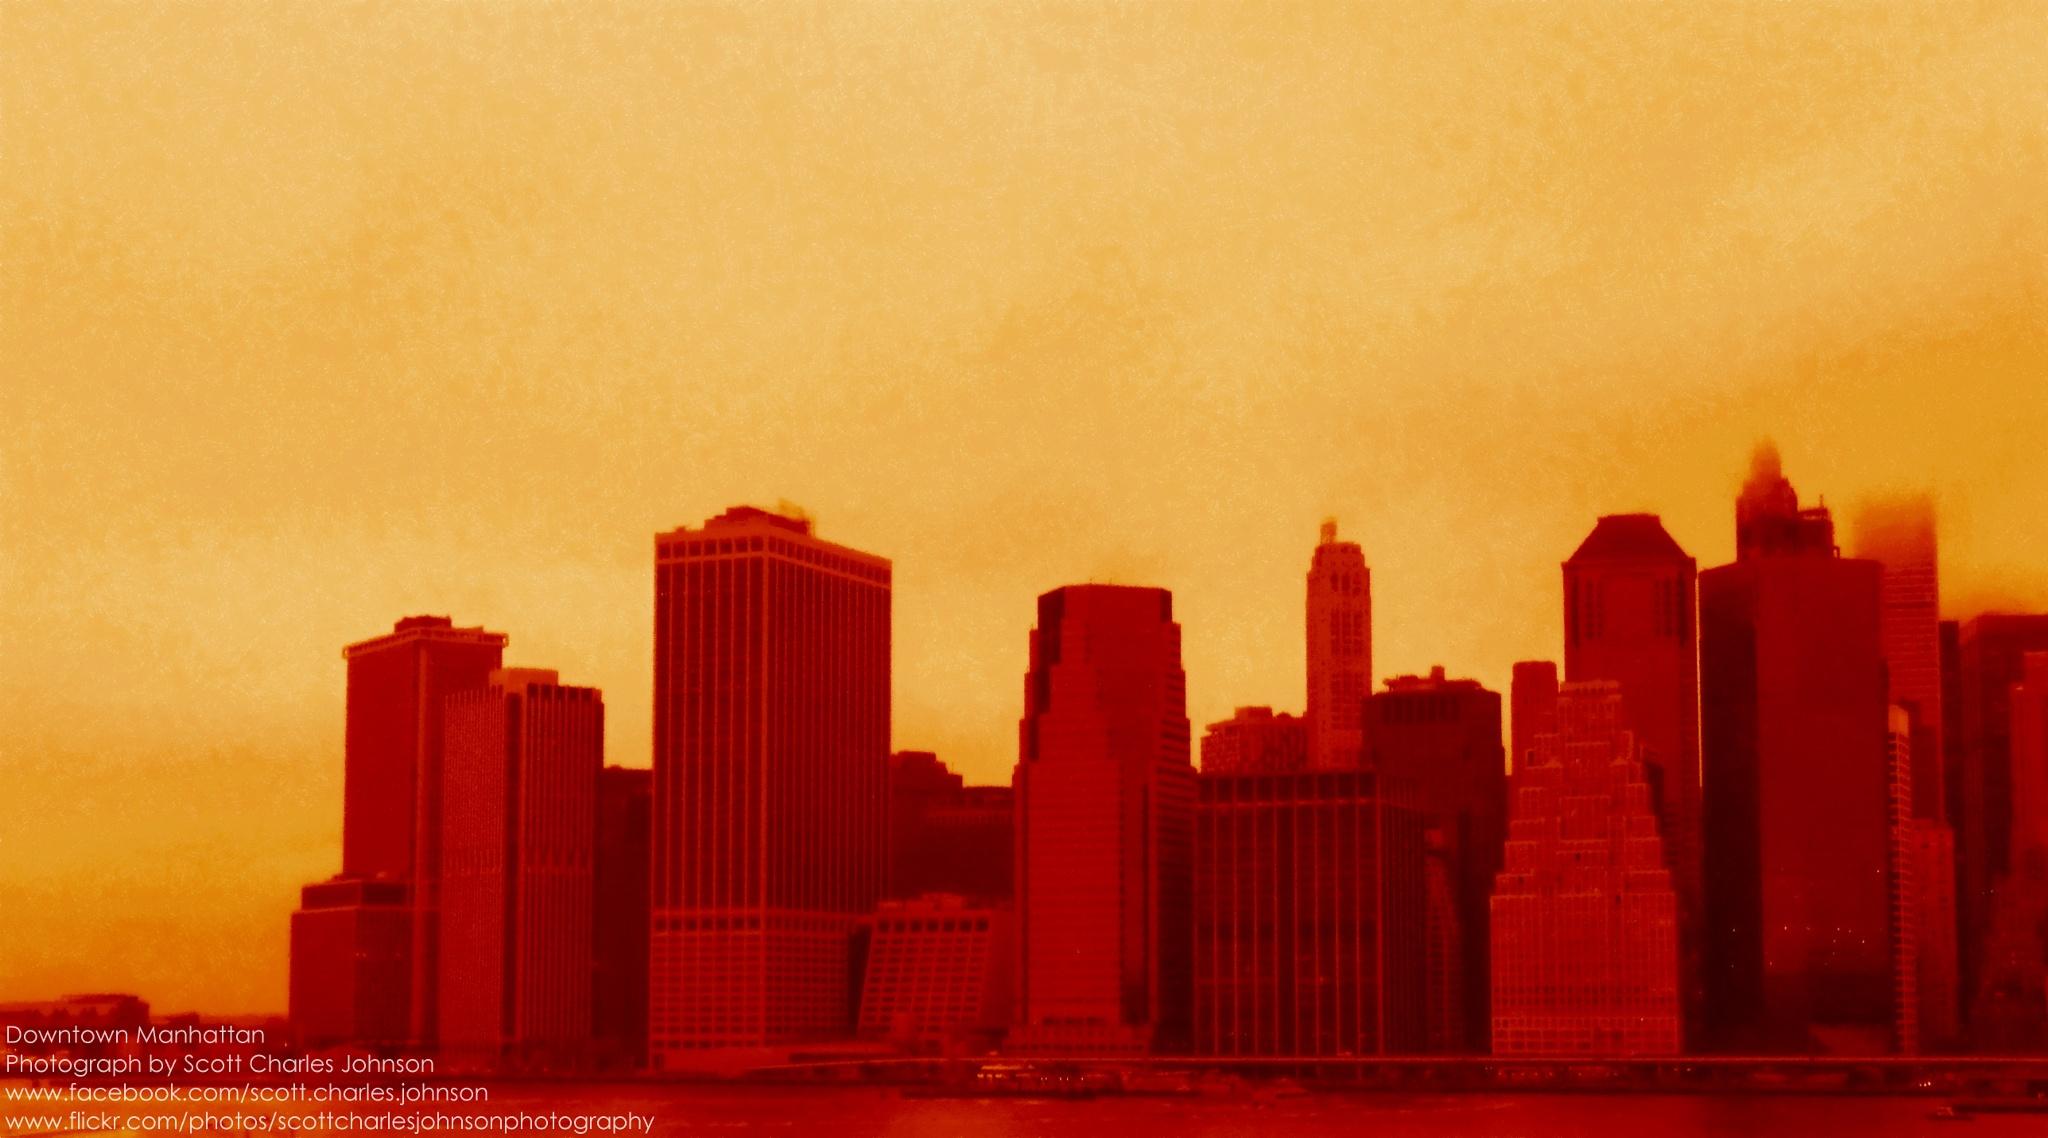 Downtown Manhattan from Brooklyn by Scott Charles Johnson